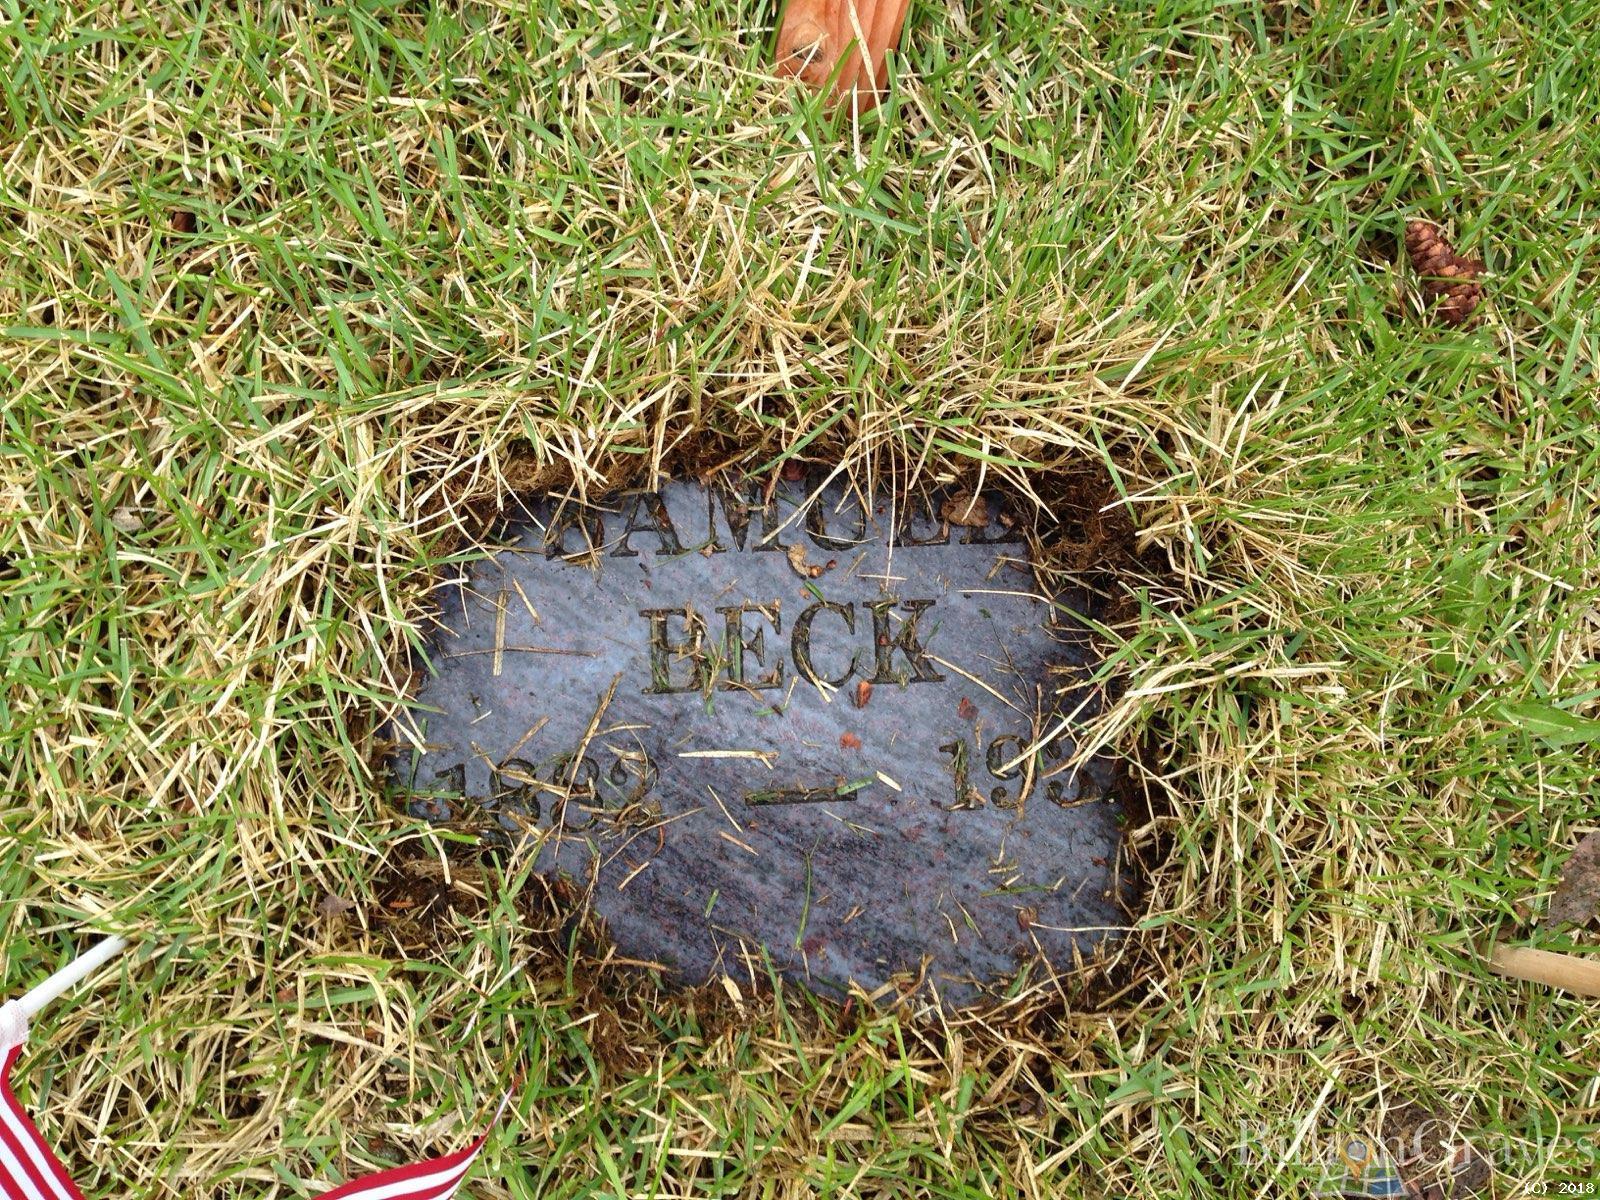 BillionGraves, gravestone, grave, damaged gravestones, cemetery, family history, ancestors, community service project, JustServe, BillionGraves app, Beck, birth, death